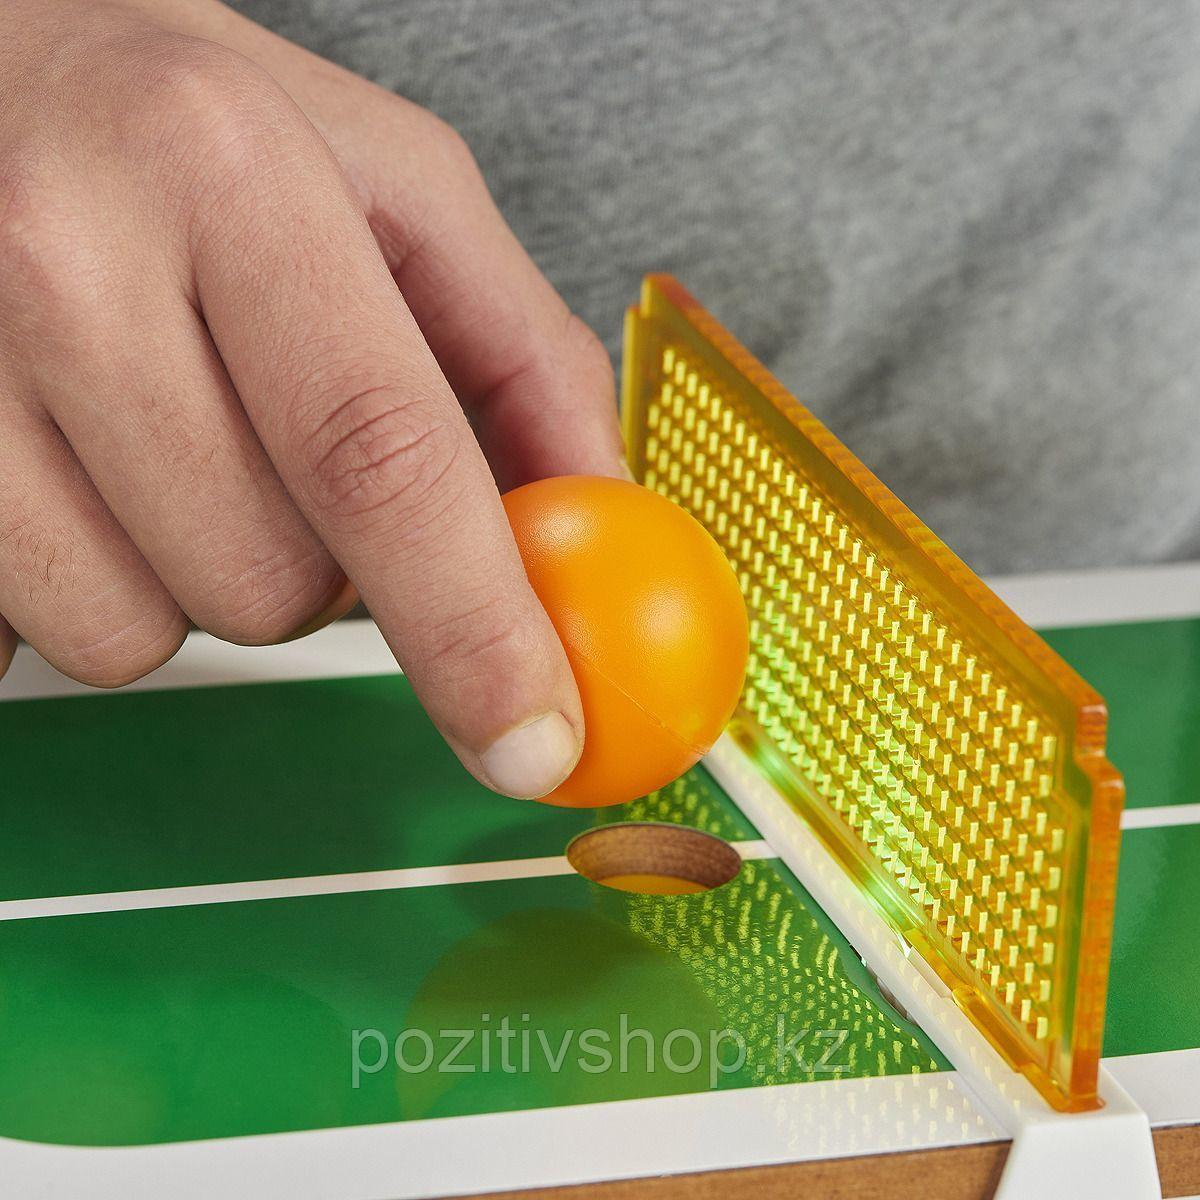 Мини Понг Hasbro - фото 7